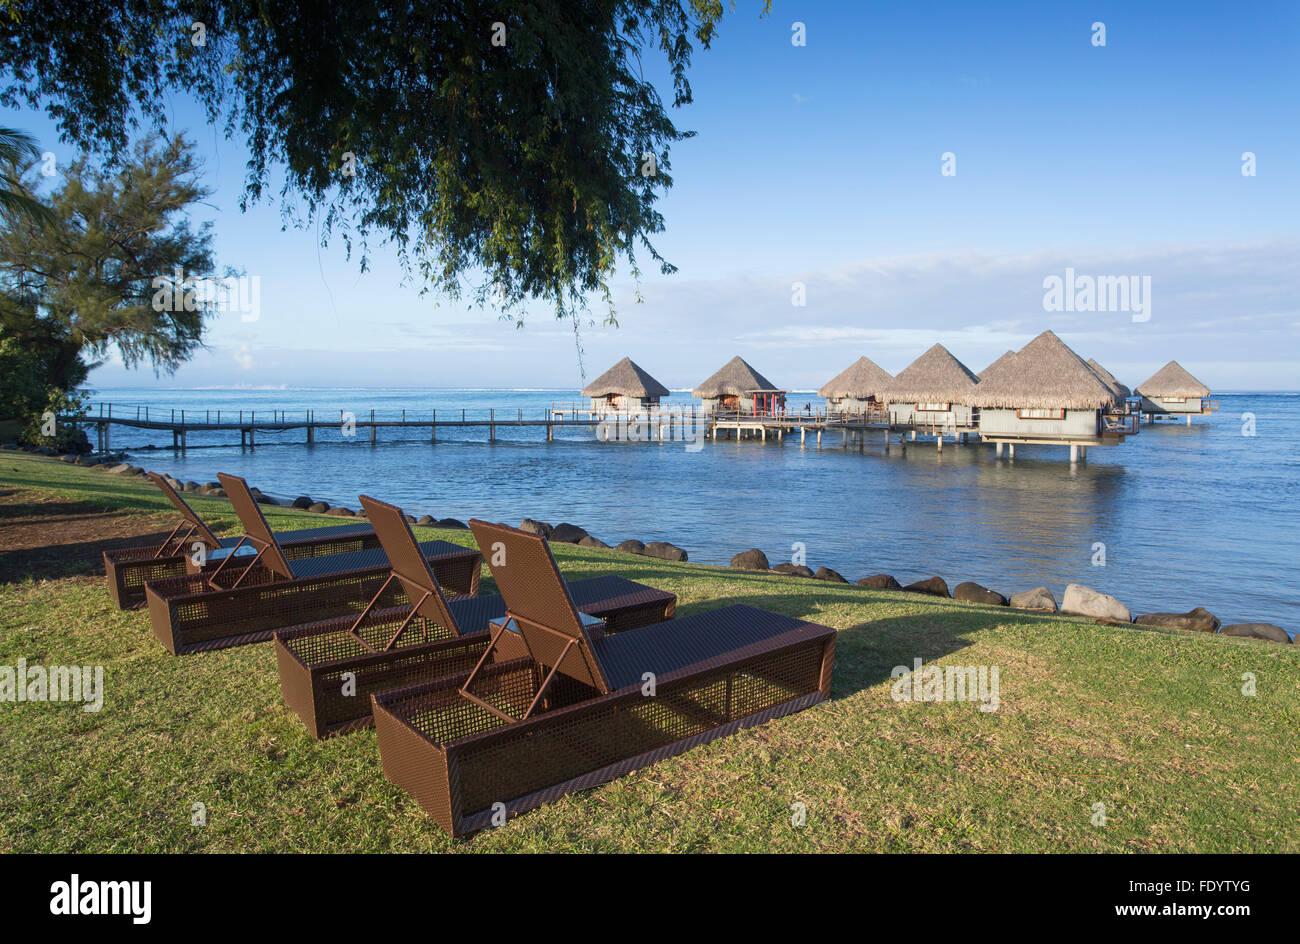 Le Meridien Tahiti Hotel, Pape'ete, Tahiti, French Polynesia - Stock Image